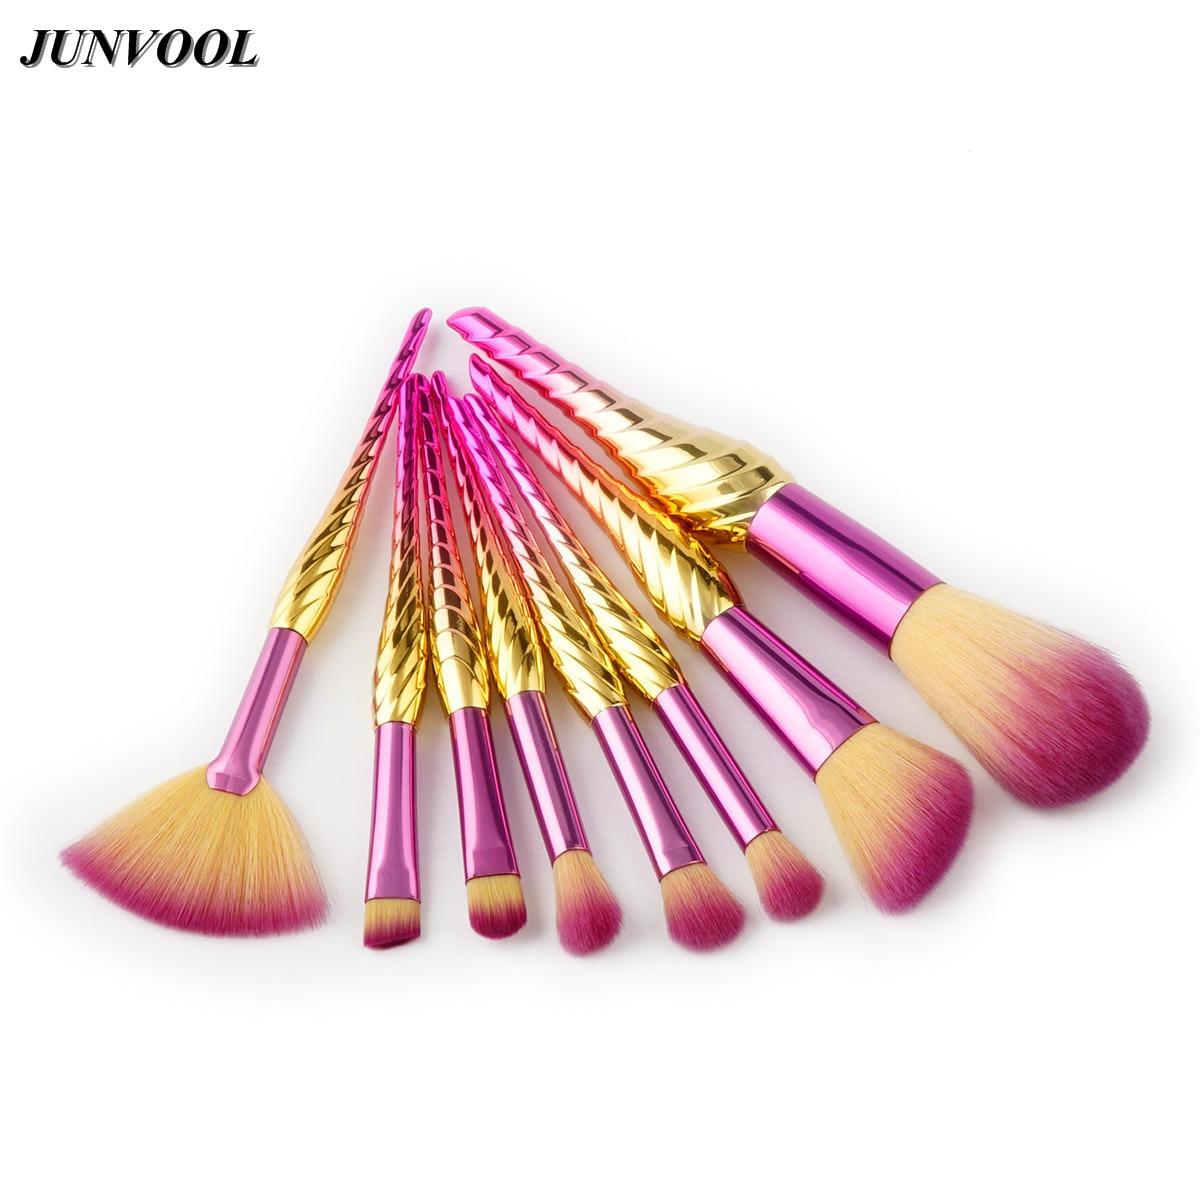 8pcs Conch Fan Makeup Brushes Thread Rainbow Professional Make Up Set Blending Powder Foundation Eyebrow Eye Contour Brush New fan makeup brush set 9pcs rainbow diy